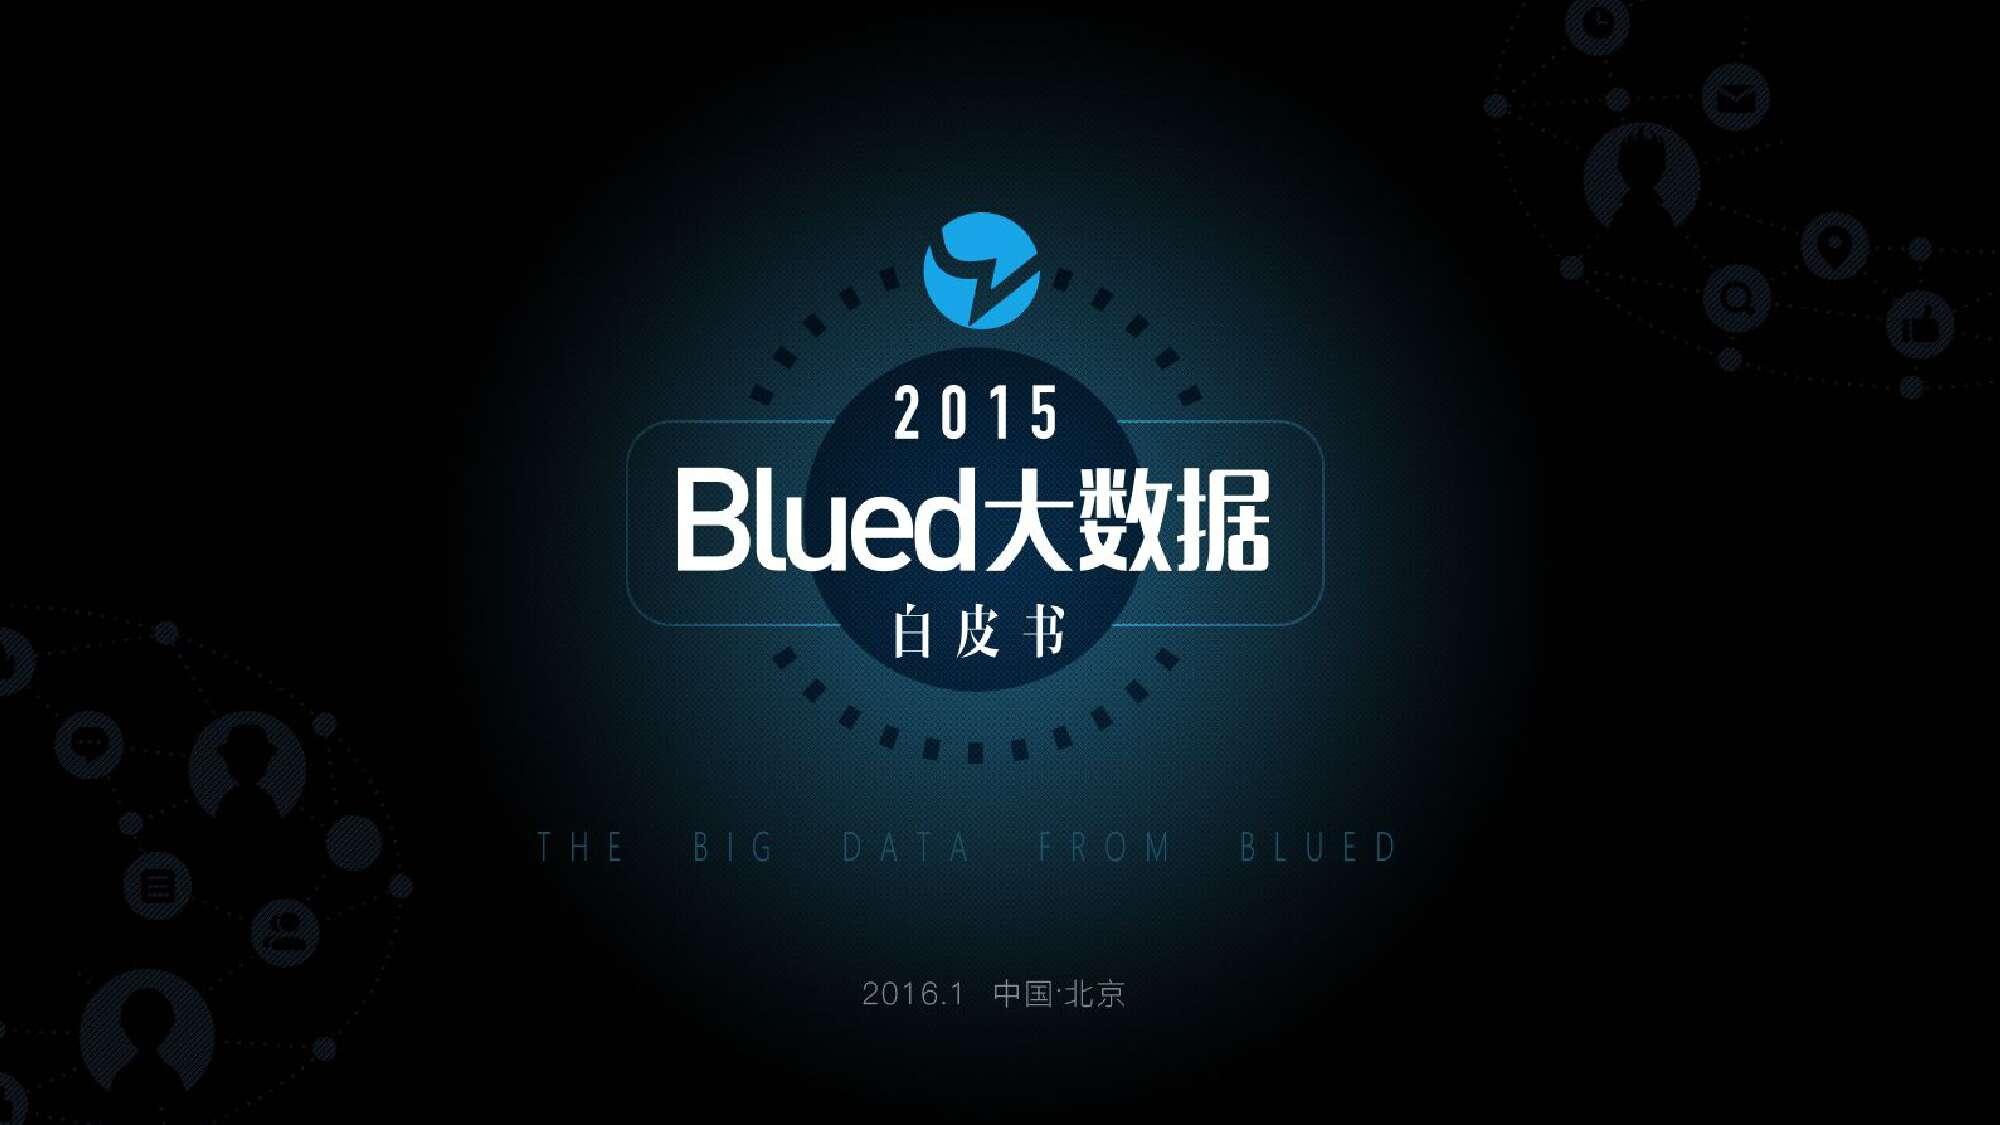 Blued2015中国同志社群大数据白皮书_000001